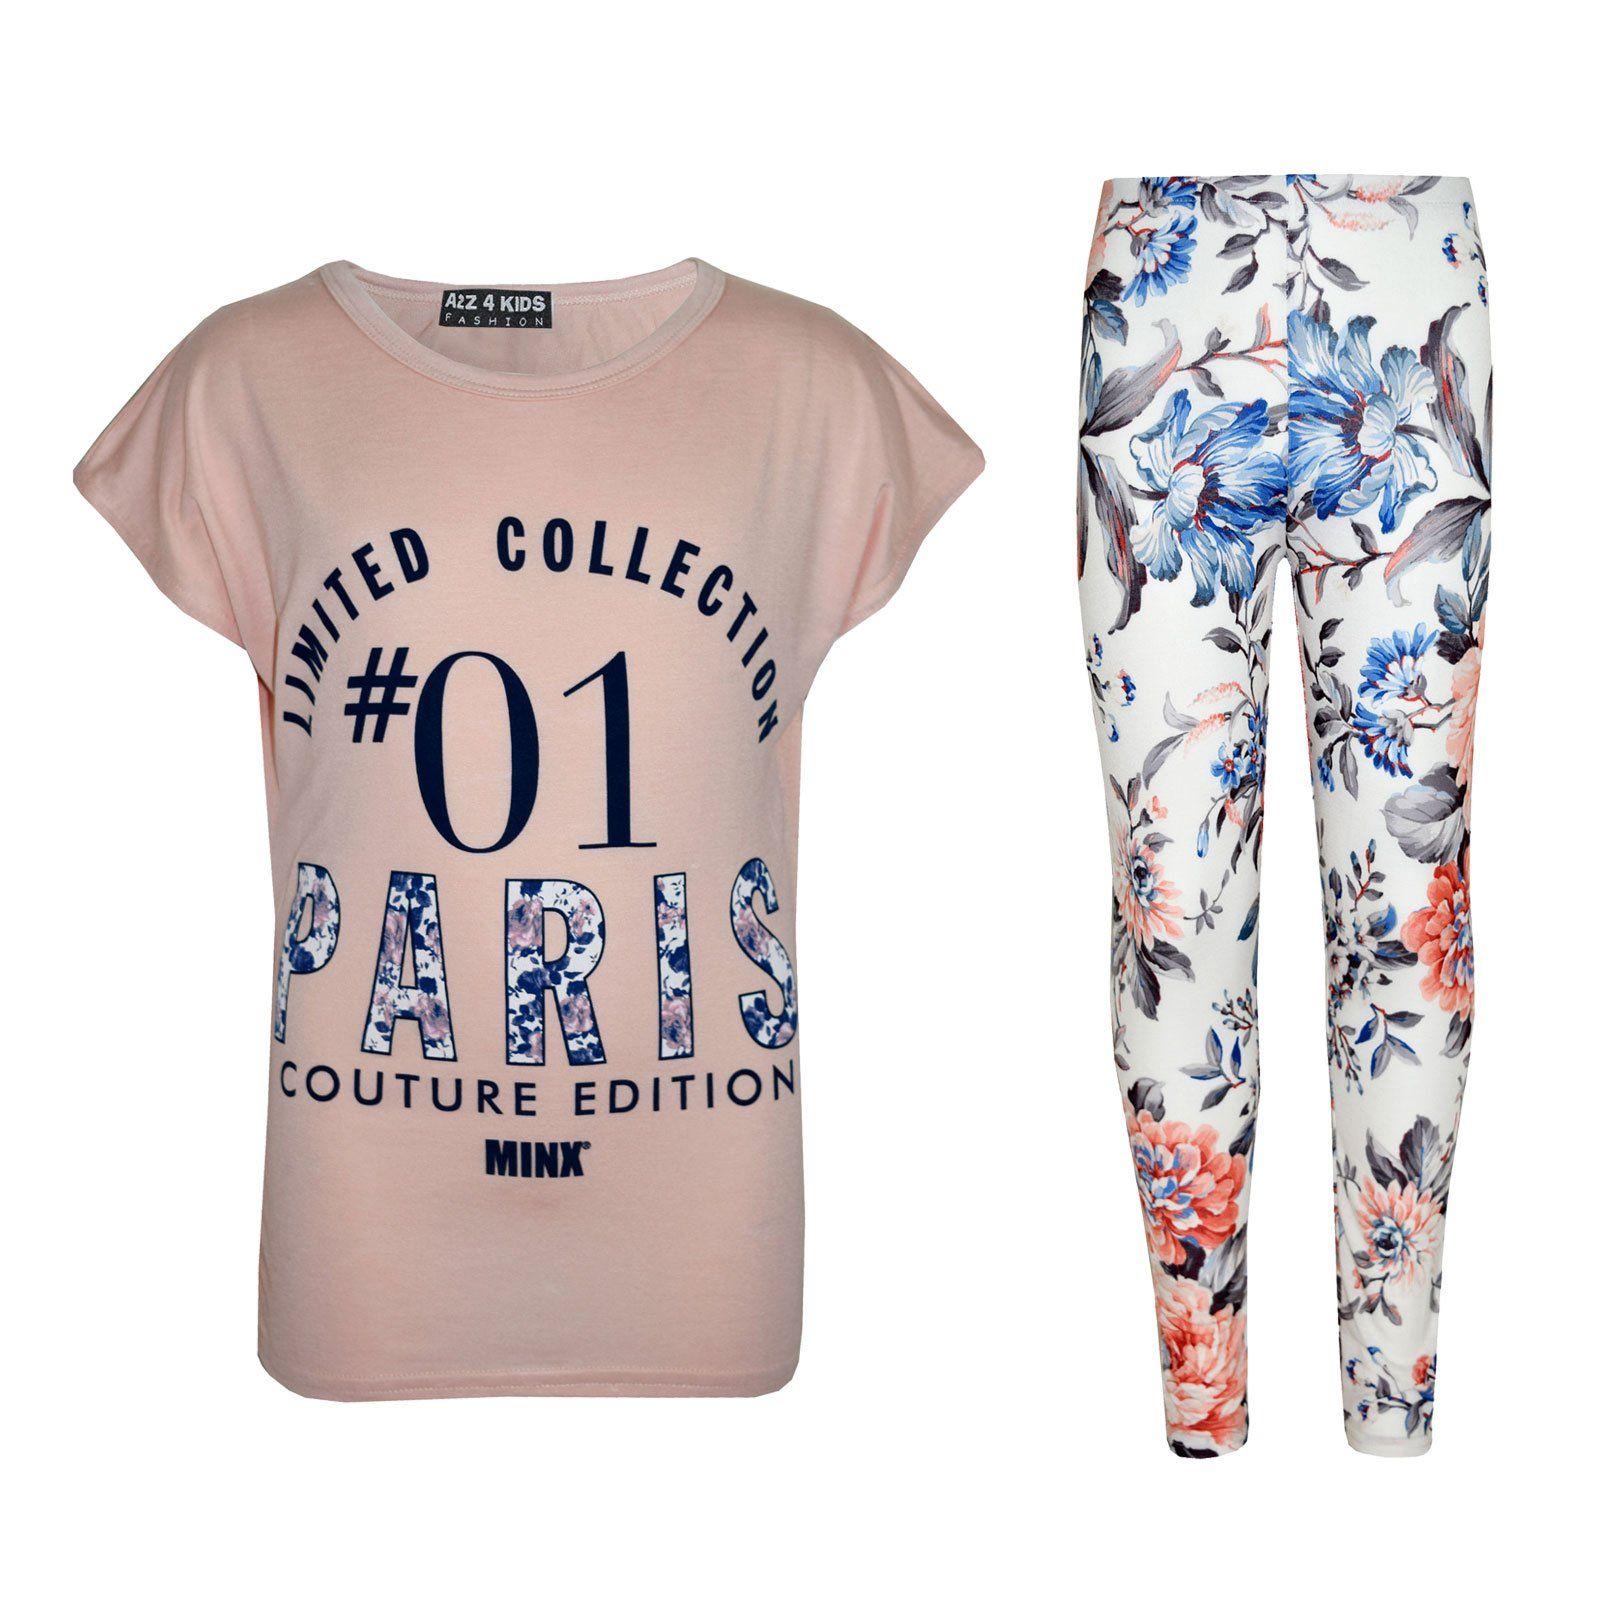 Girls Top Kids #01 Paris Print T Shirt Top /& Multi Leoaprd Legging Set 7-13 Year